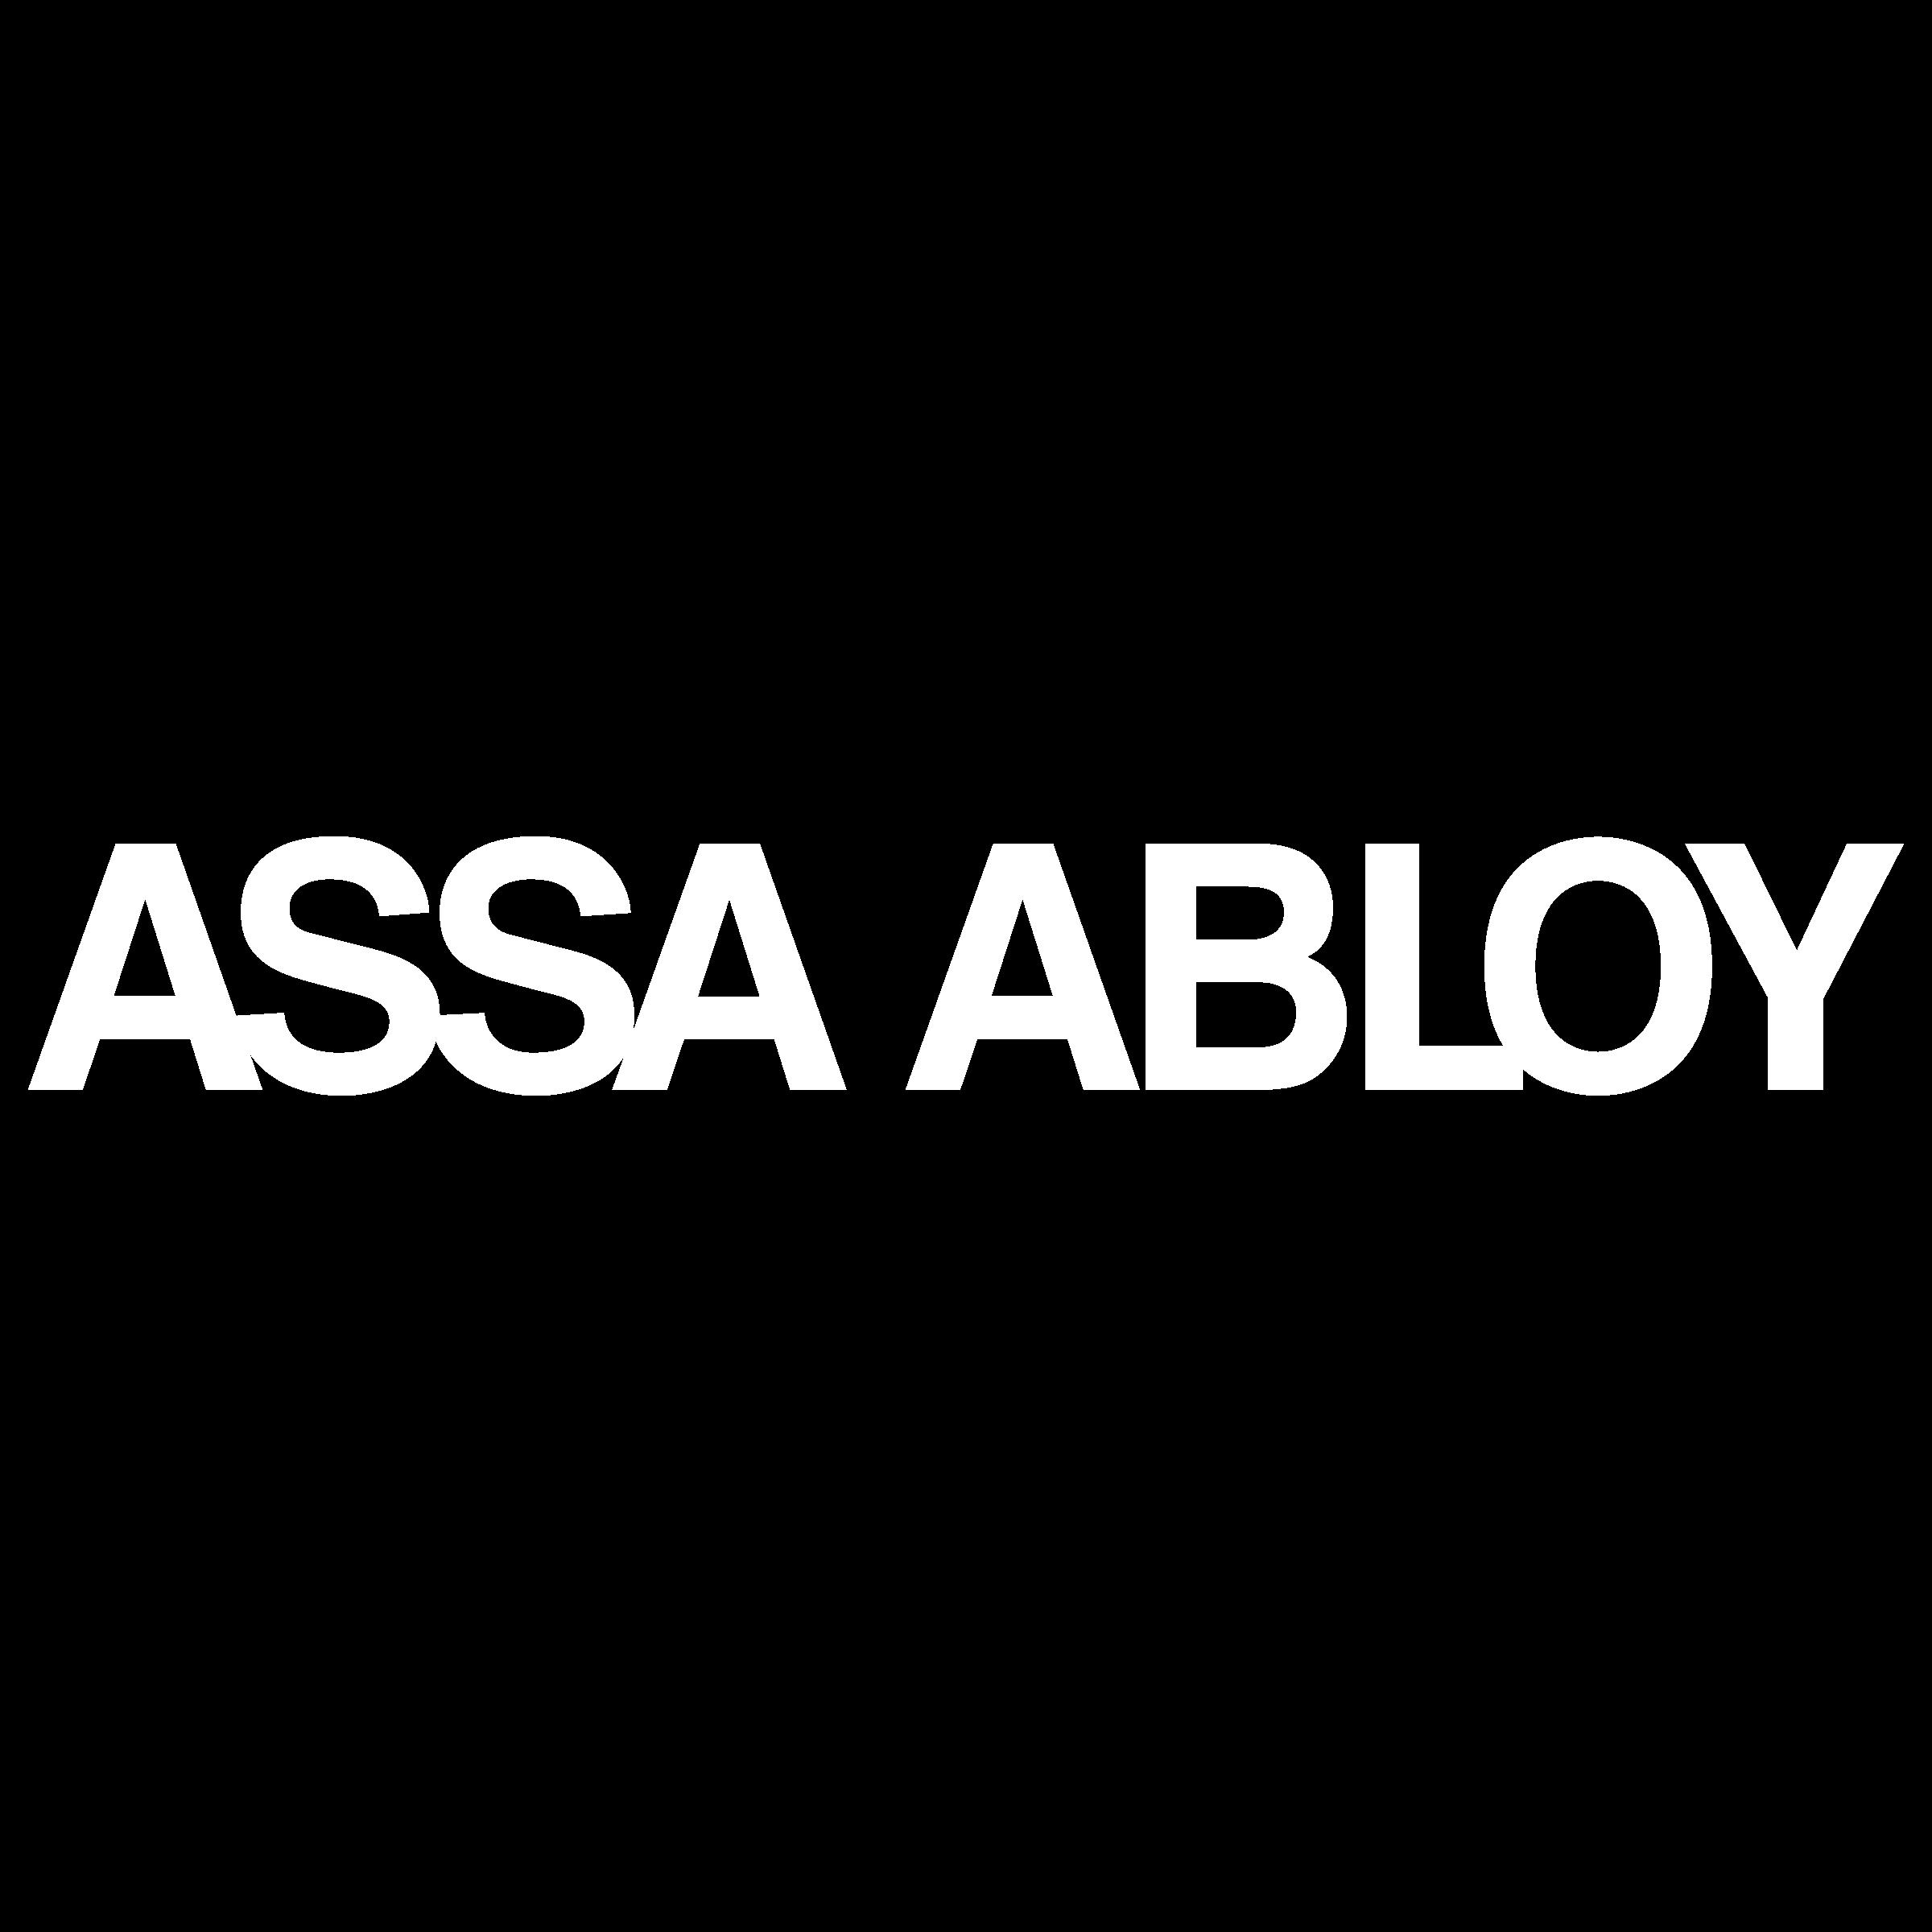 Assa Abloy Homepage logo